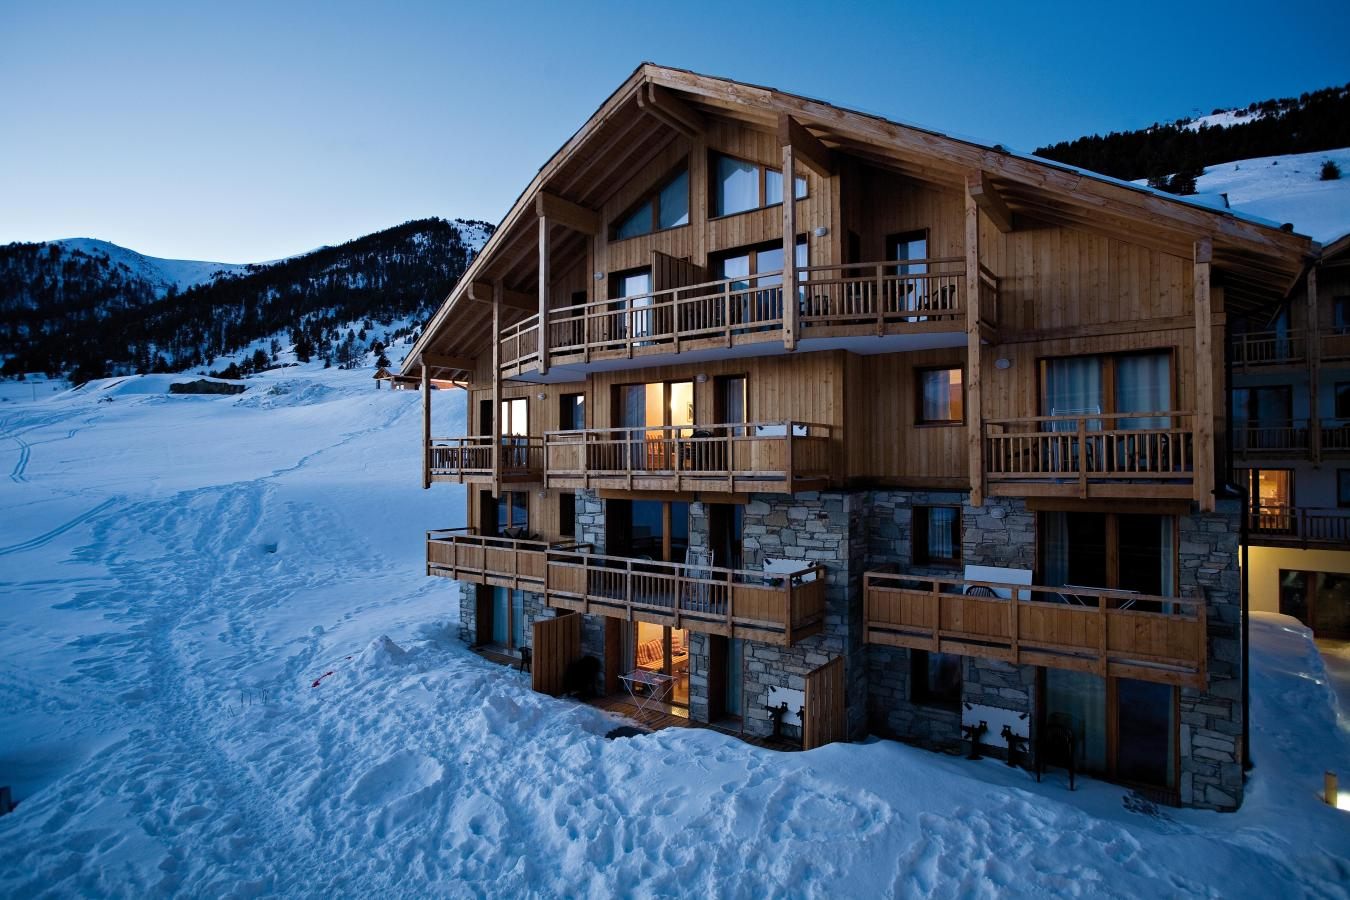 residence-club-mmv-le-hameau-des-airelles-469025.jpg